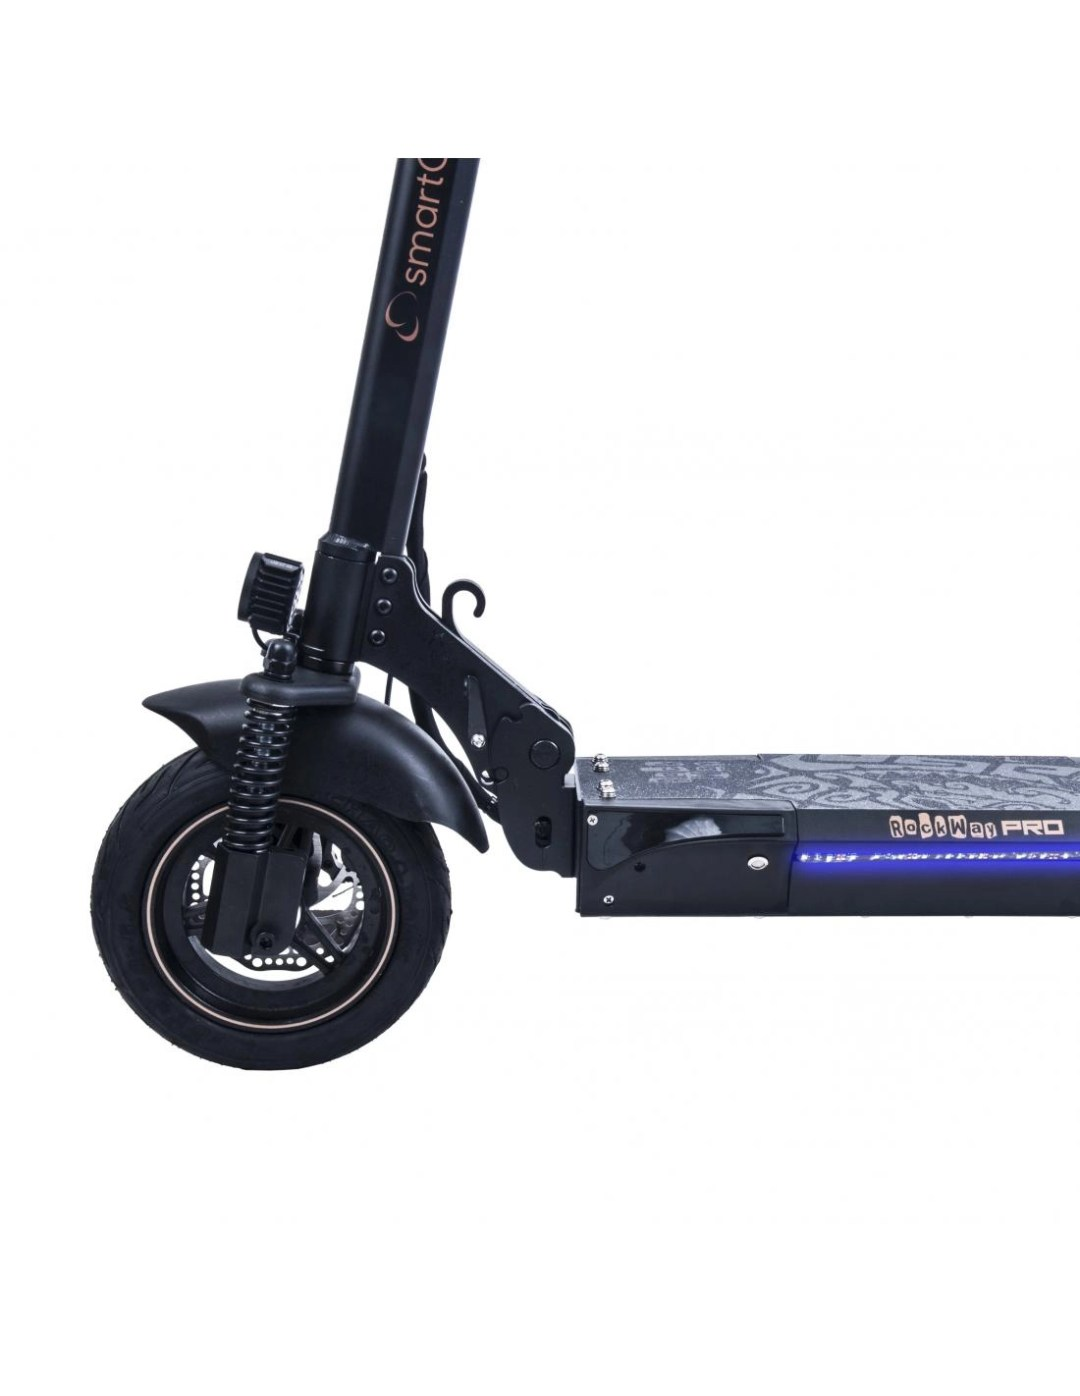 patinete electrico Smartgyro Tockway Pro Ruedas